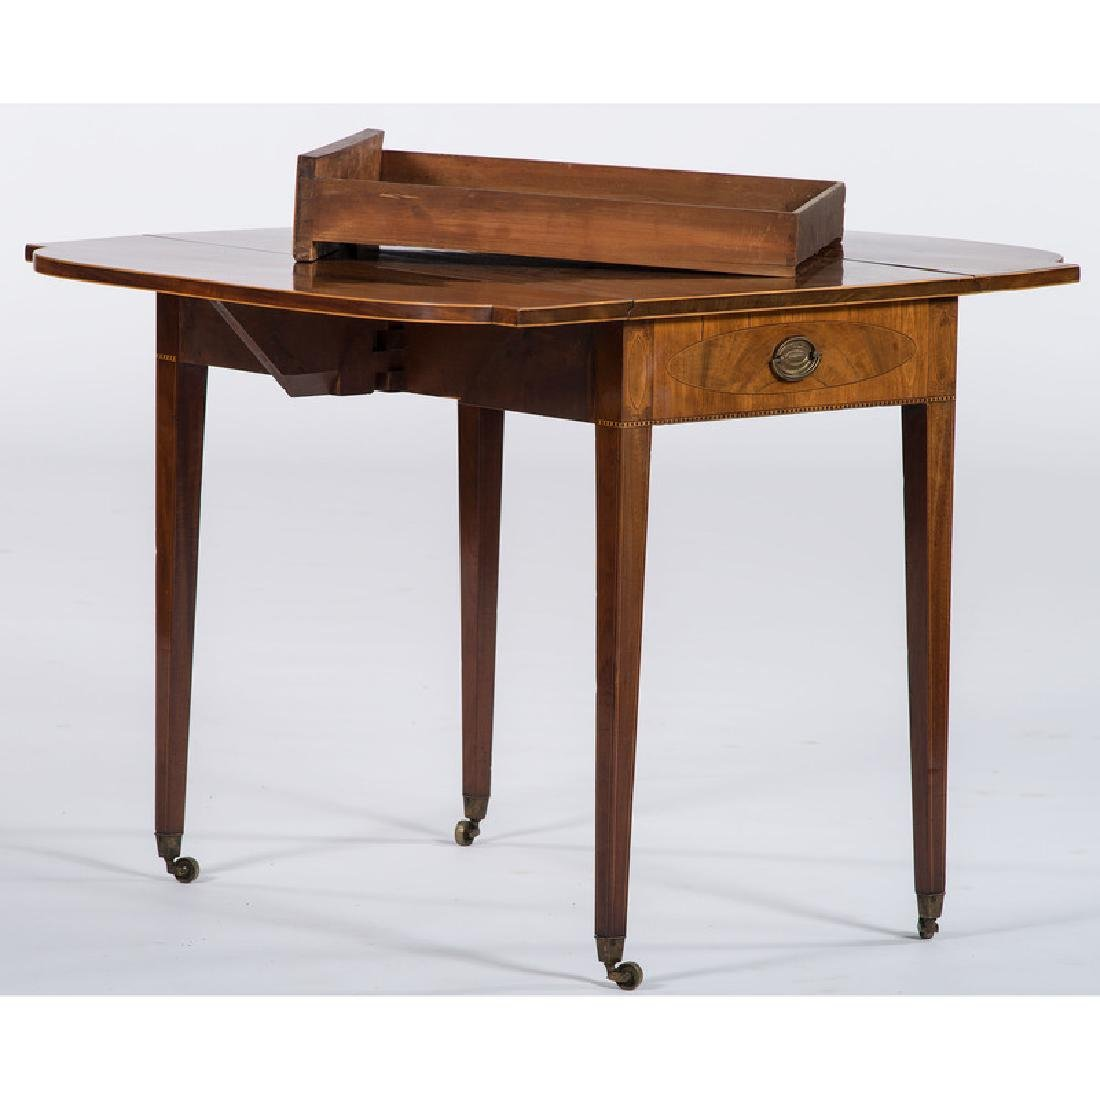 English Hepplewhite Pembroke Table - 3